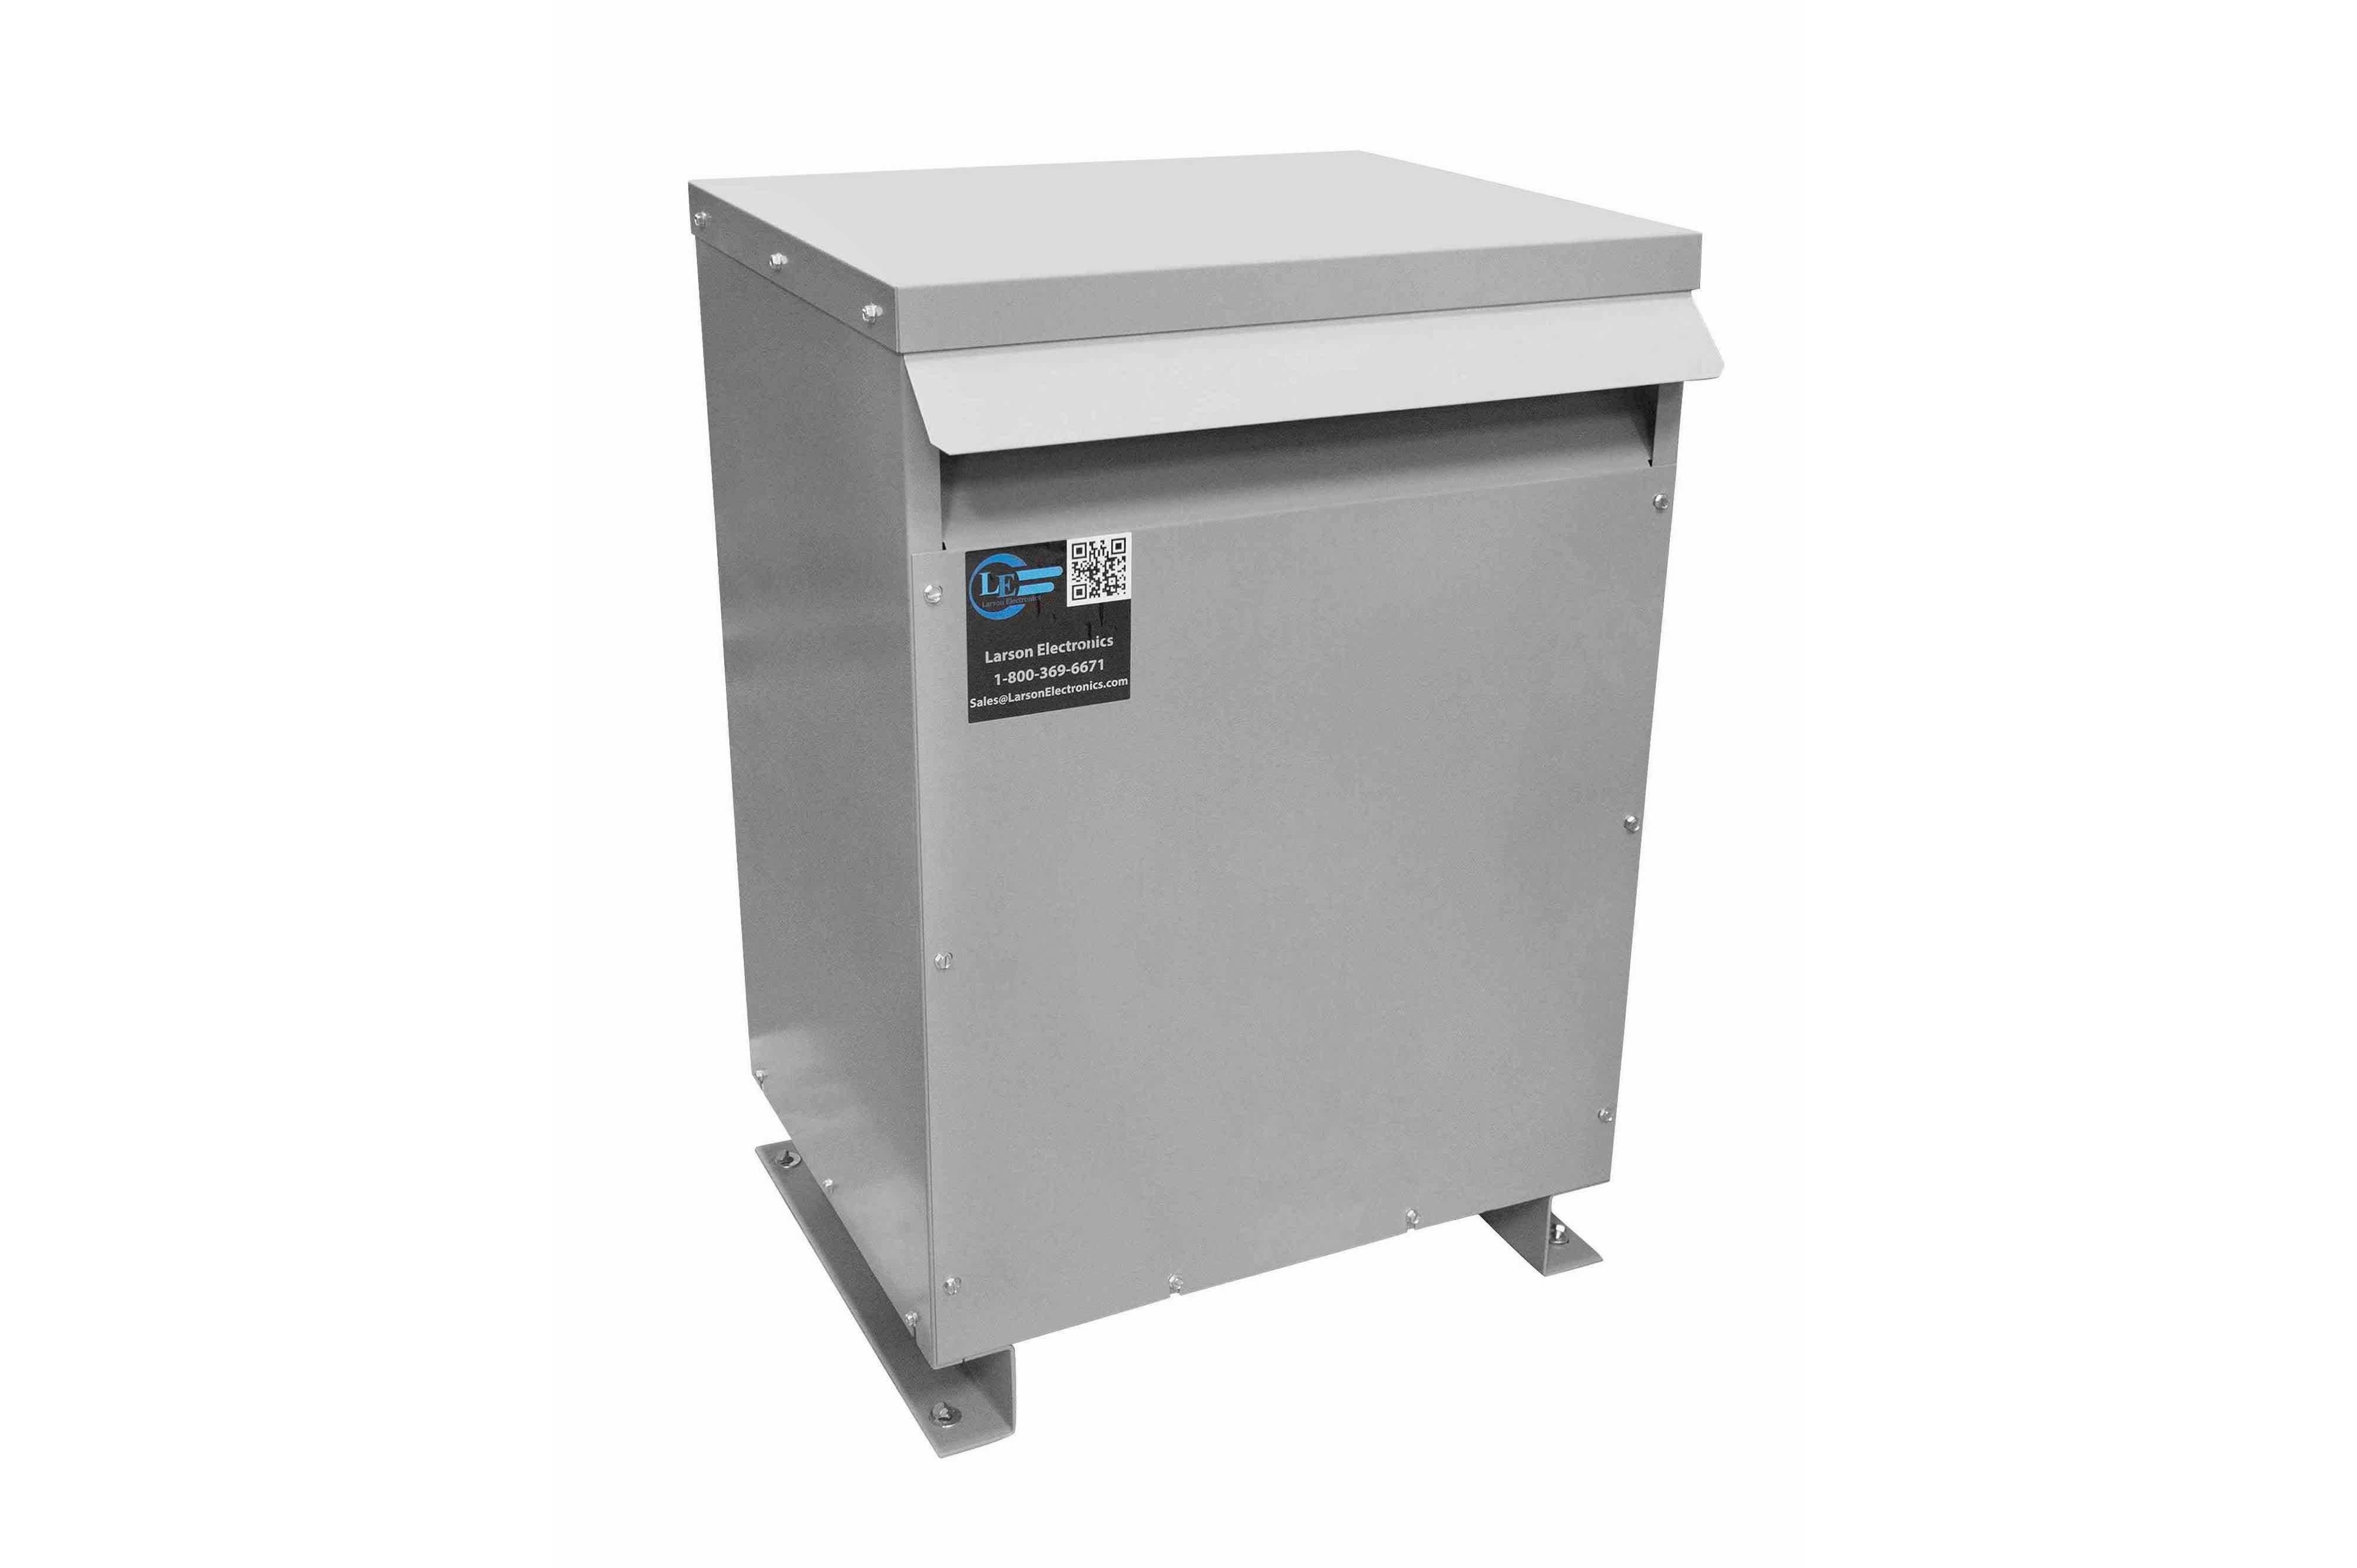 29 kVA 3PH Isolation Transformer, 575V Wye Primary, 400V Delta Secondary, N3R, Ventilated, 60 Hz